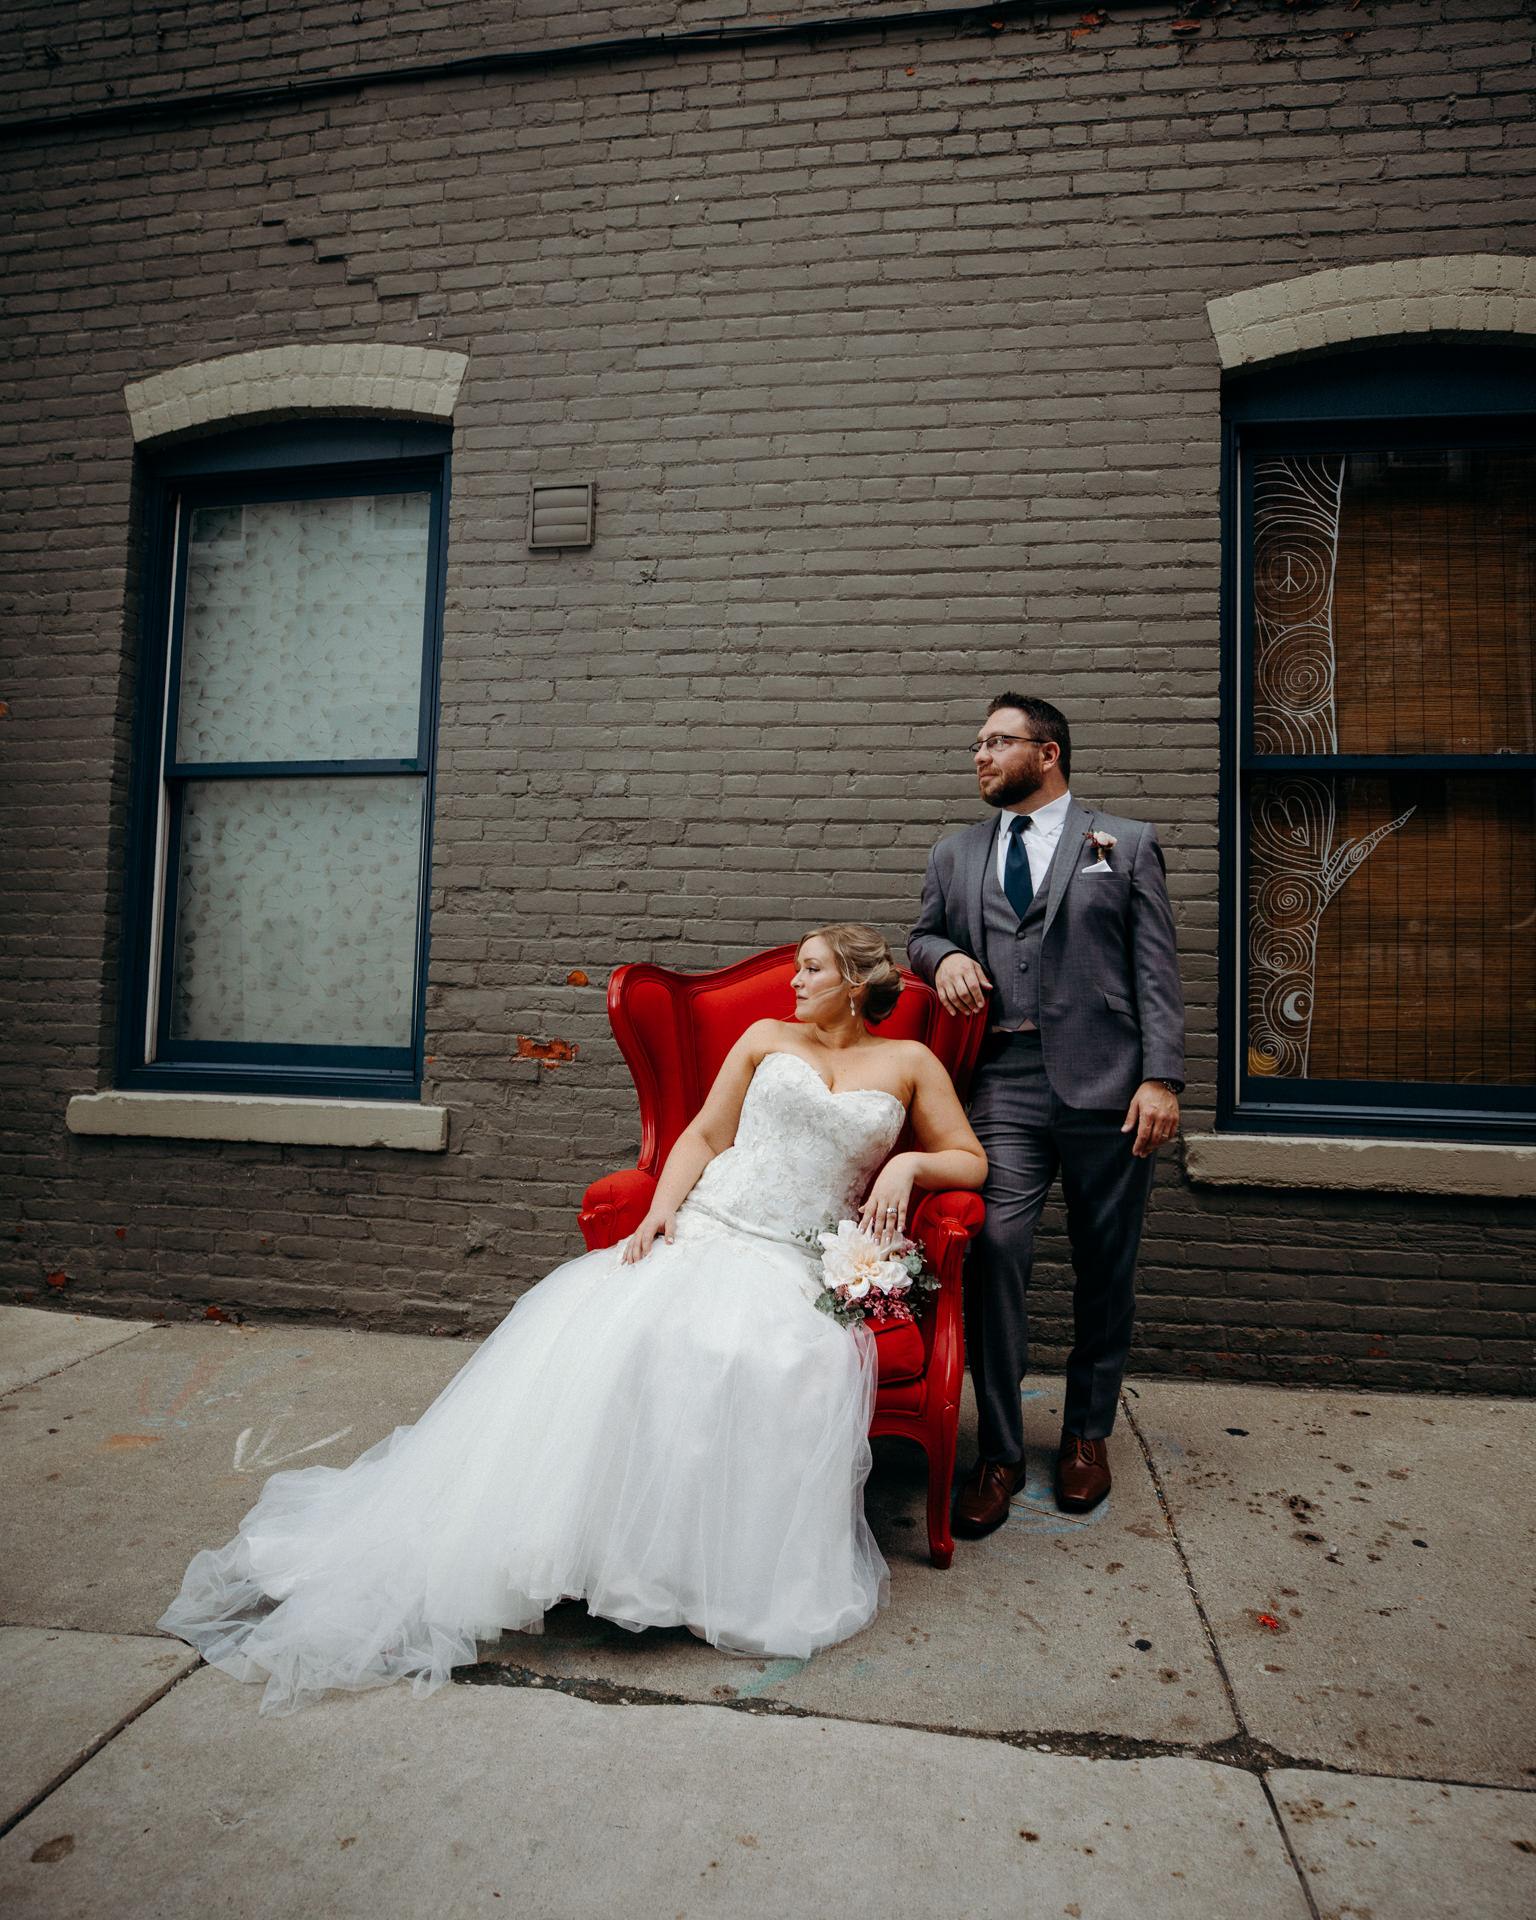 Grant Beachy Weddings photography elkhart south bend goshen warsaw-025.jpg